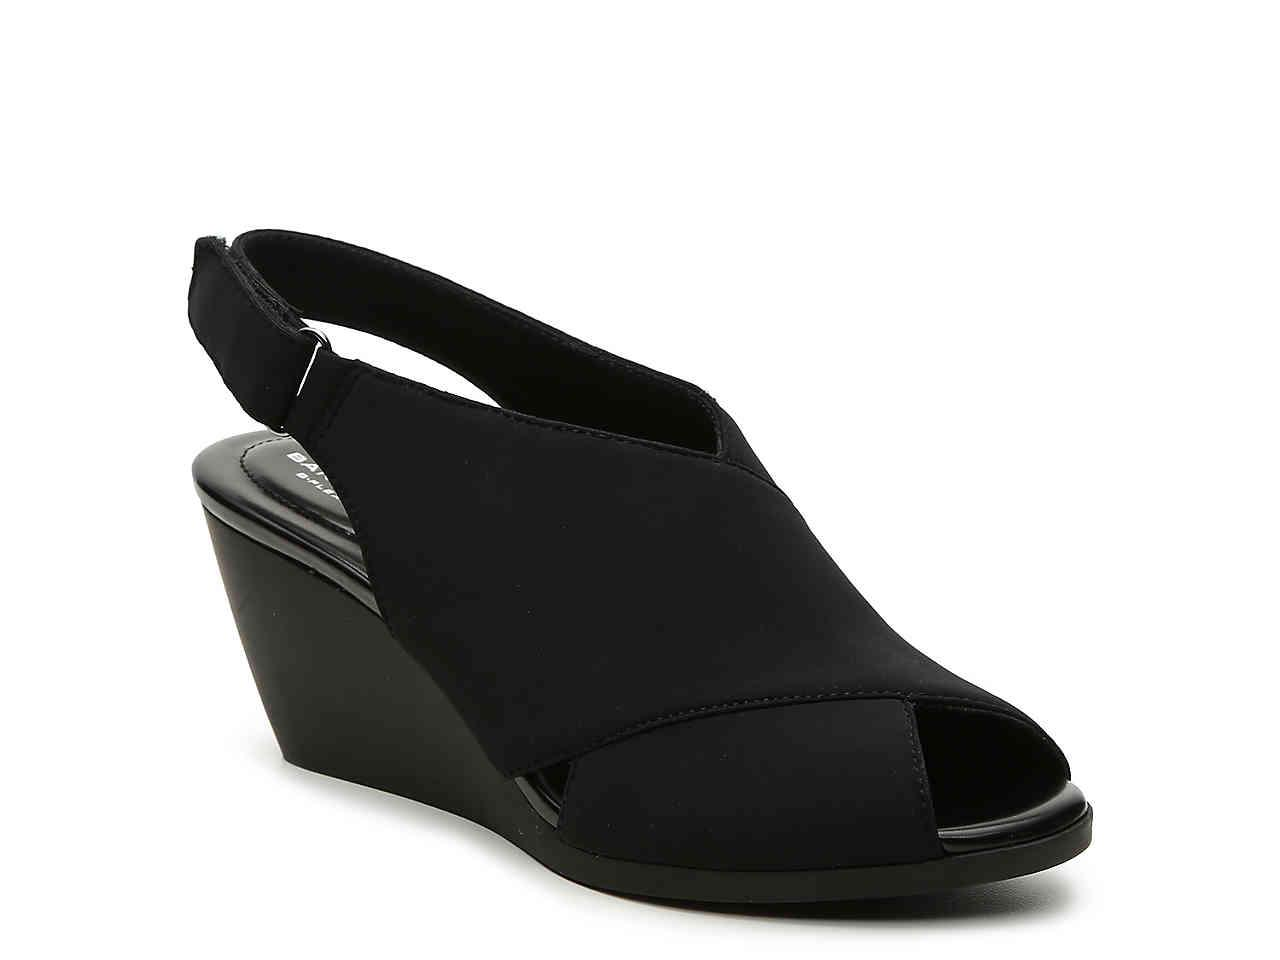 4e4b8ee1c90c Lyst - Bandolino Afton Wedge Sandal in Black